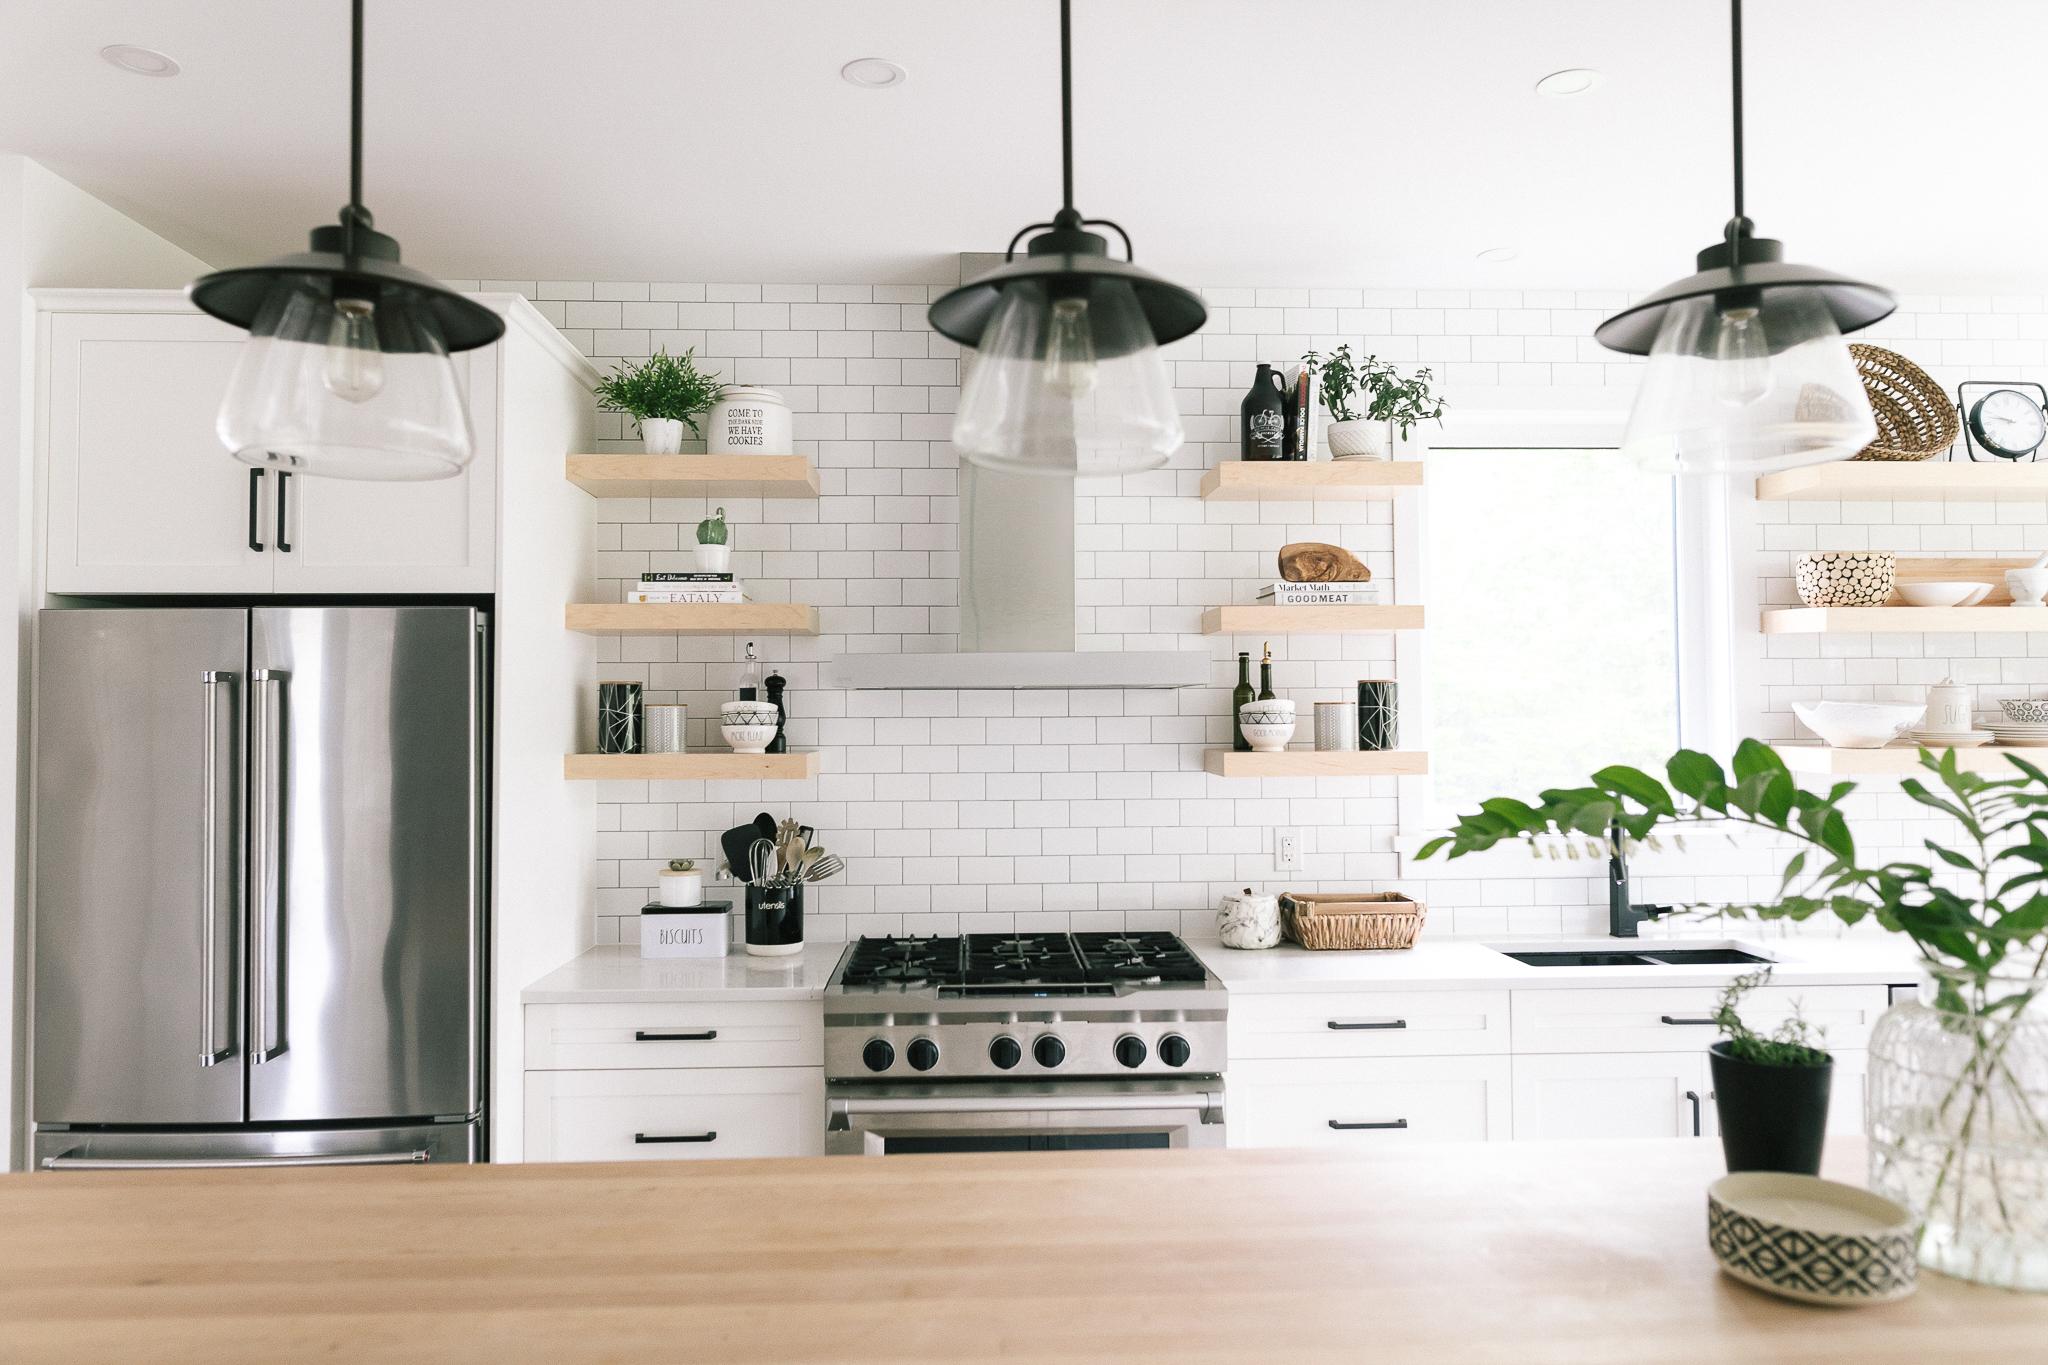 Interior-Design-Carp-Project-Kitchen-White-Subway-Tiles